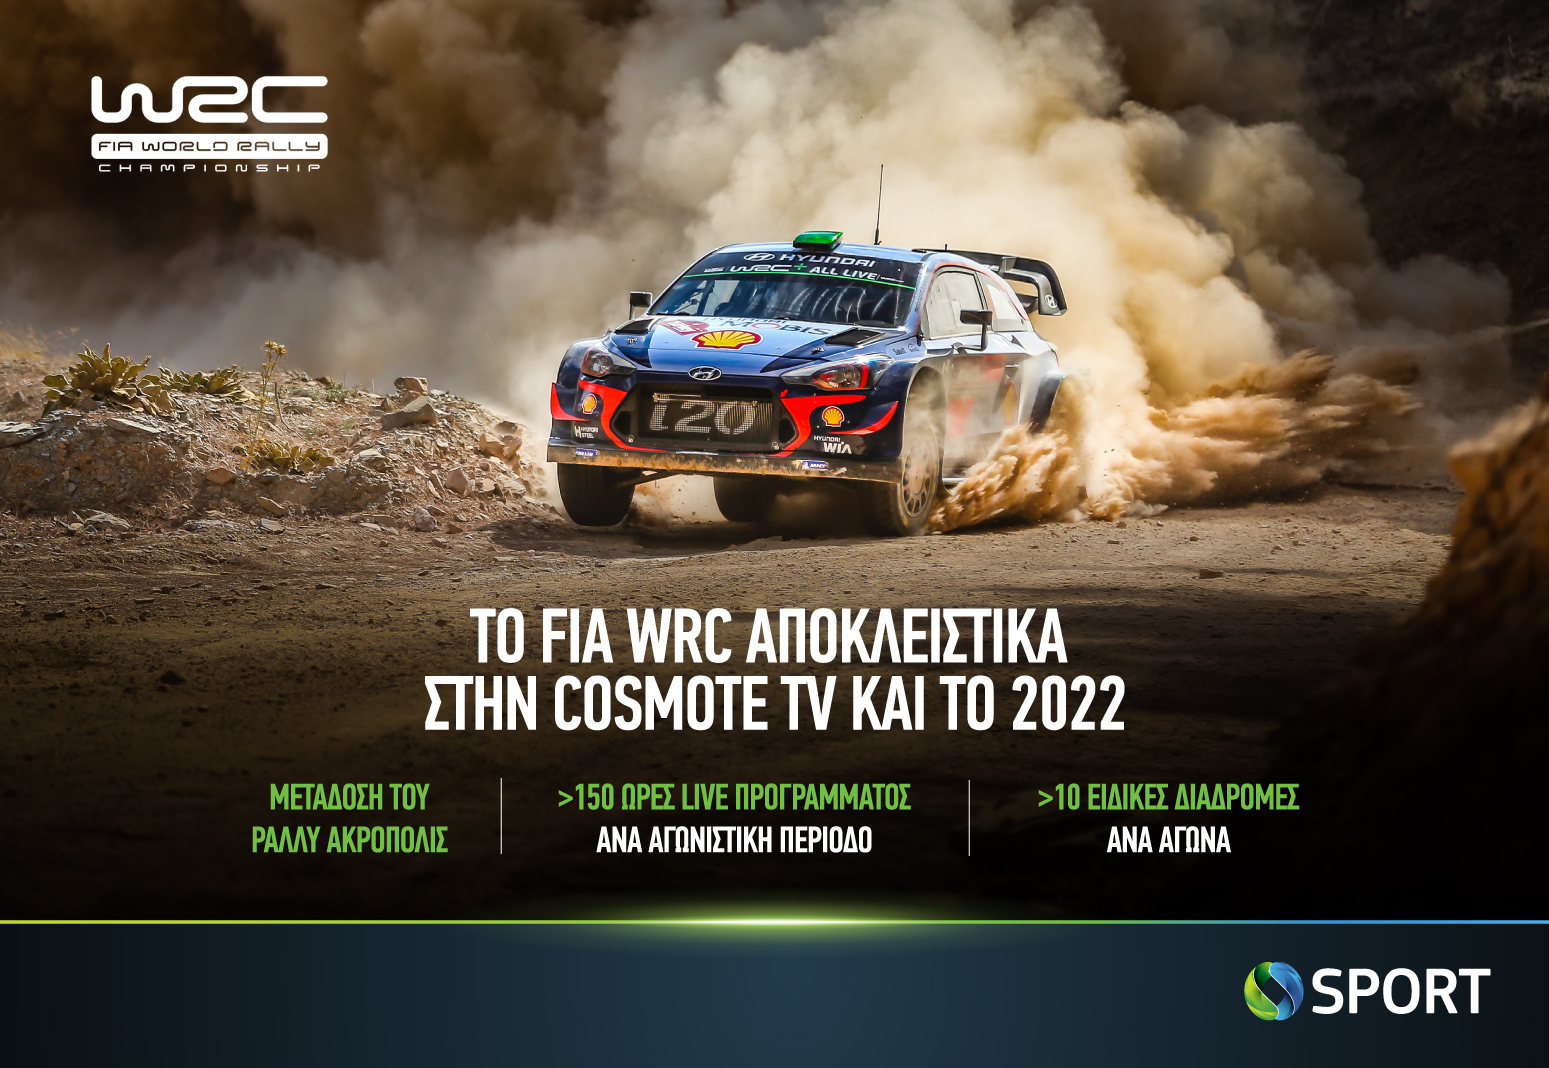 COSMOTETV WRC 2022